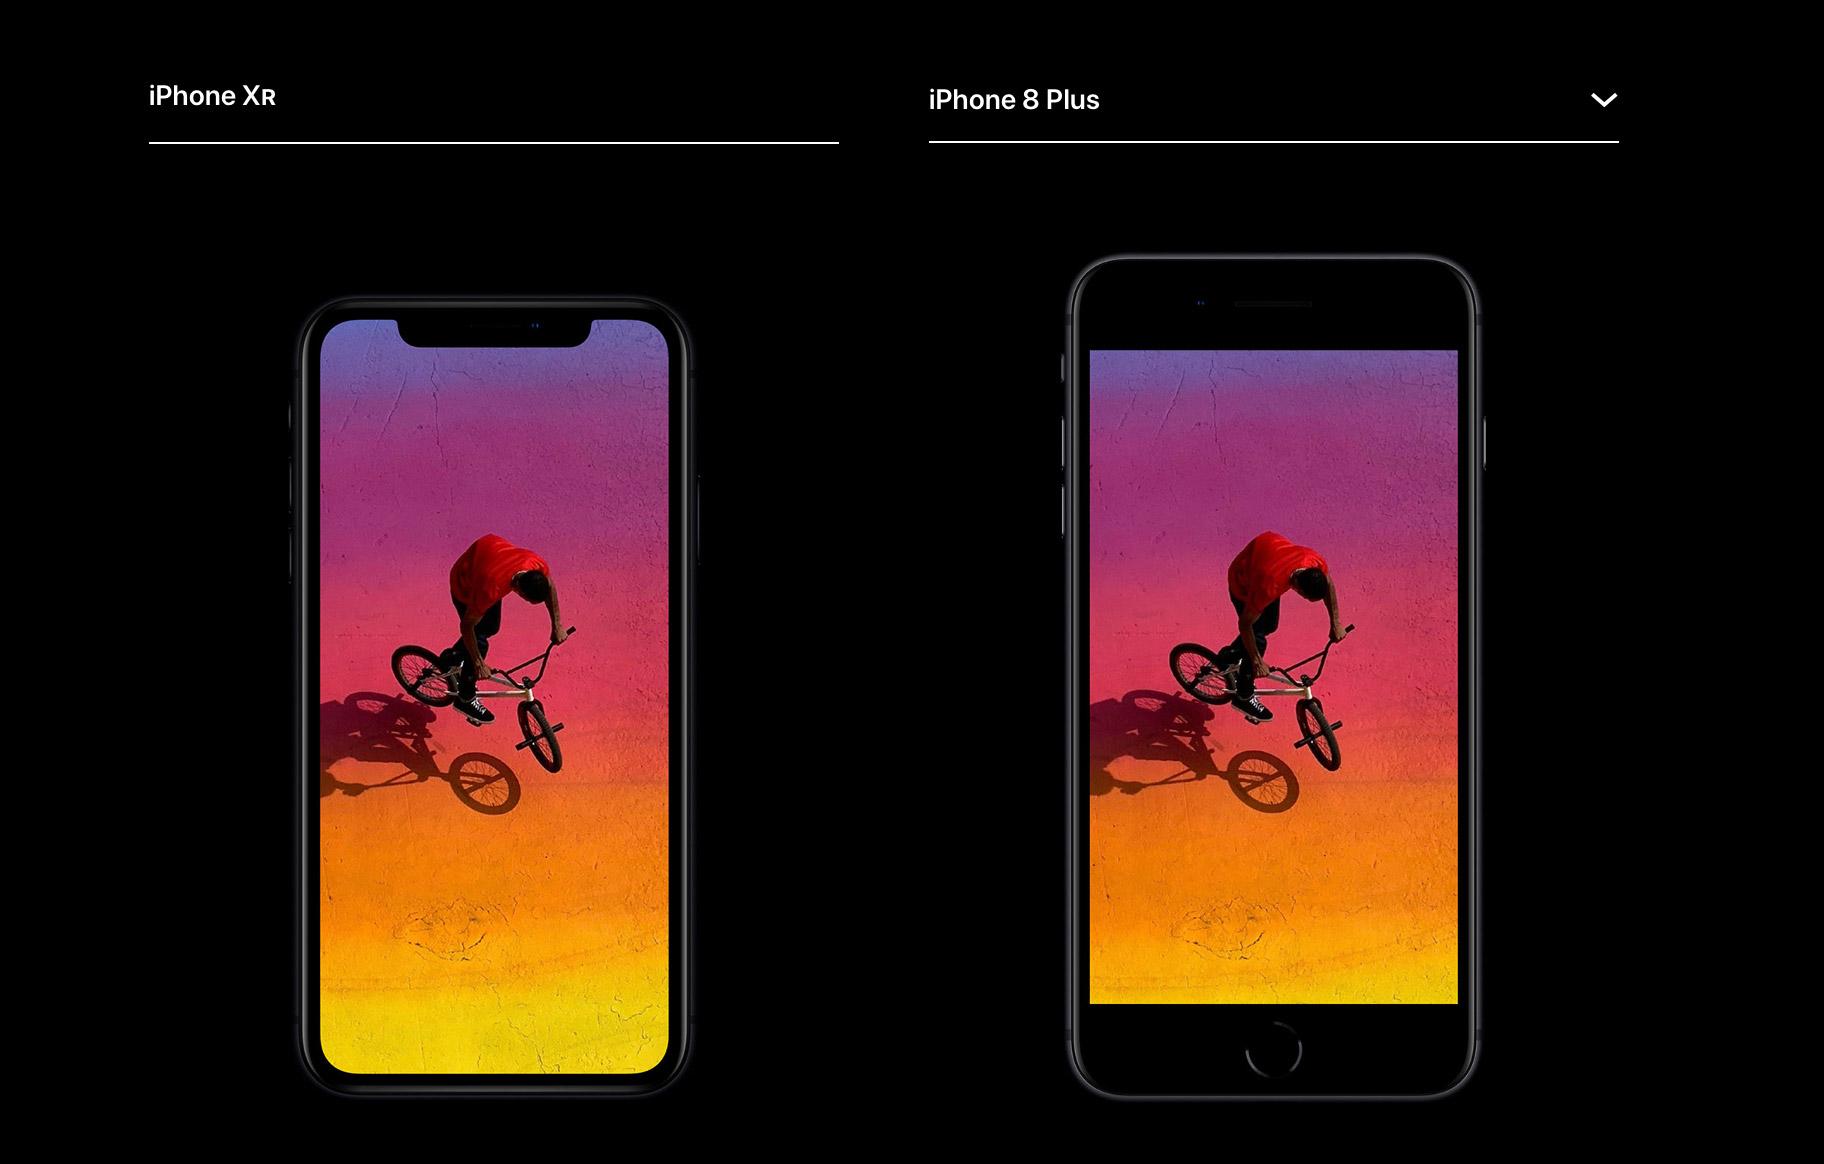 iphone_xr_screen.jpg